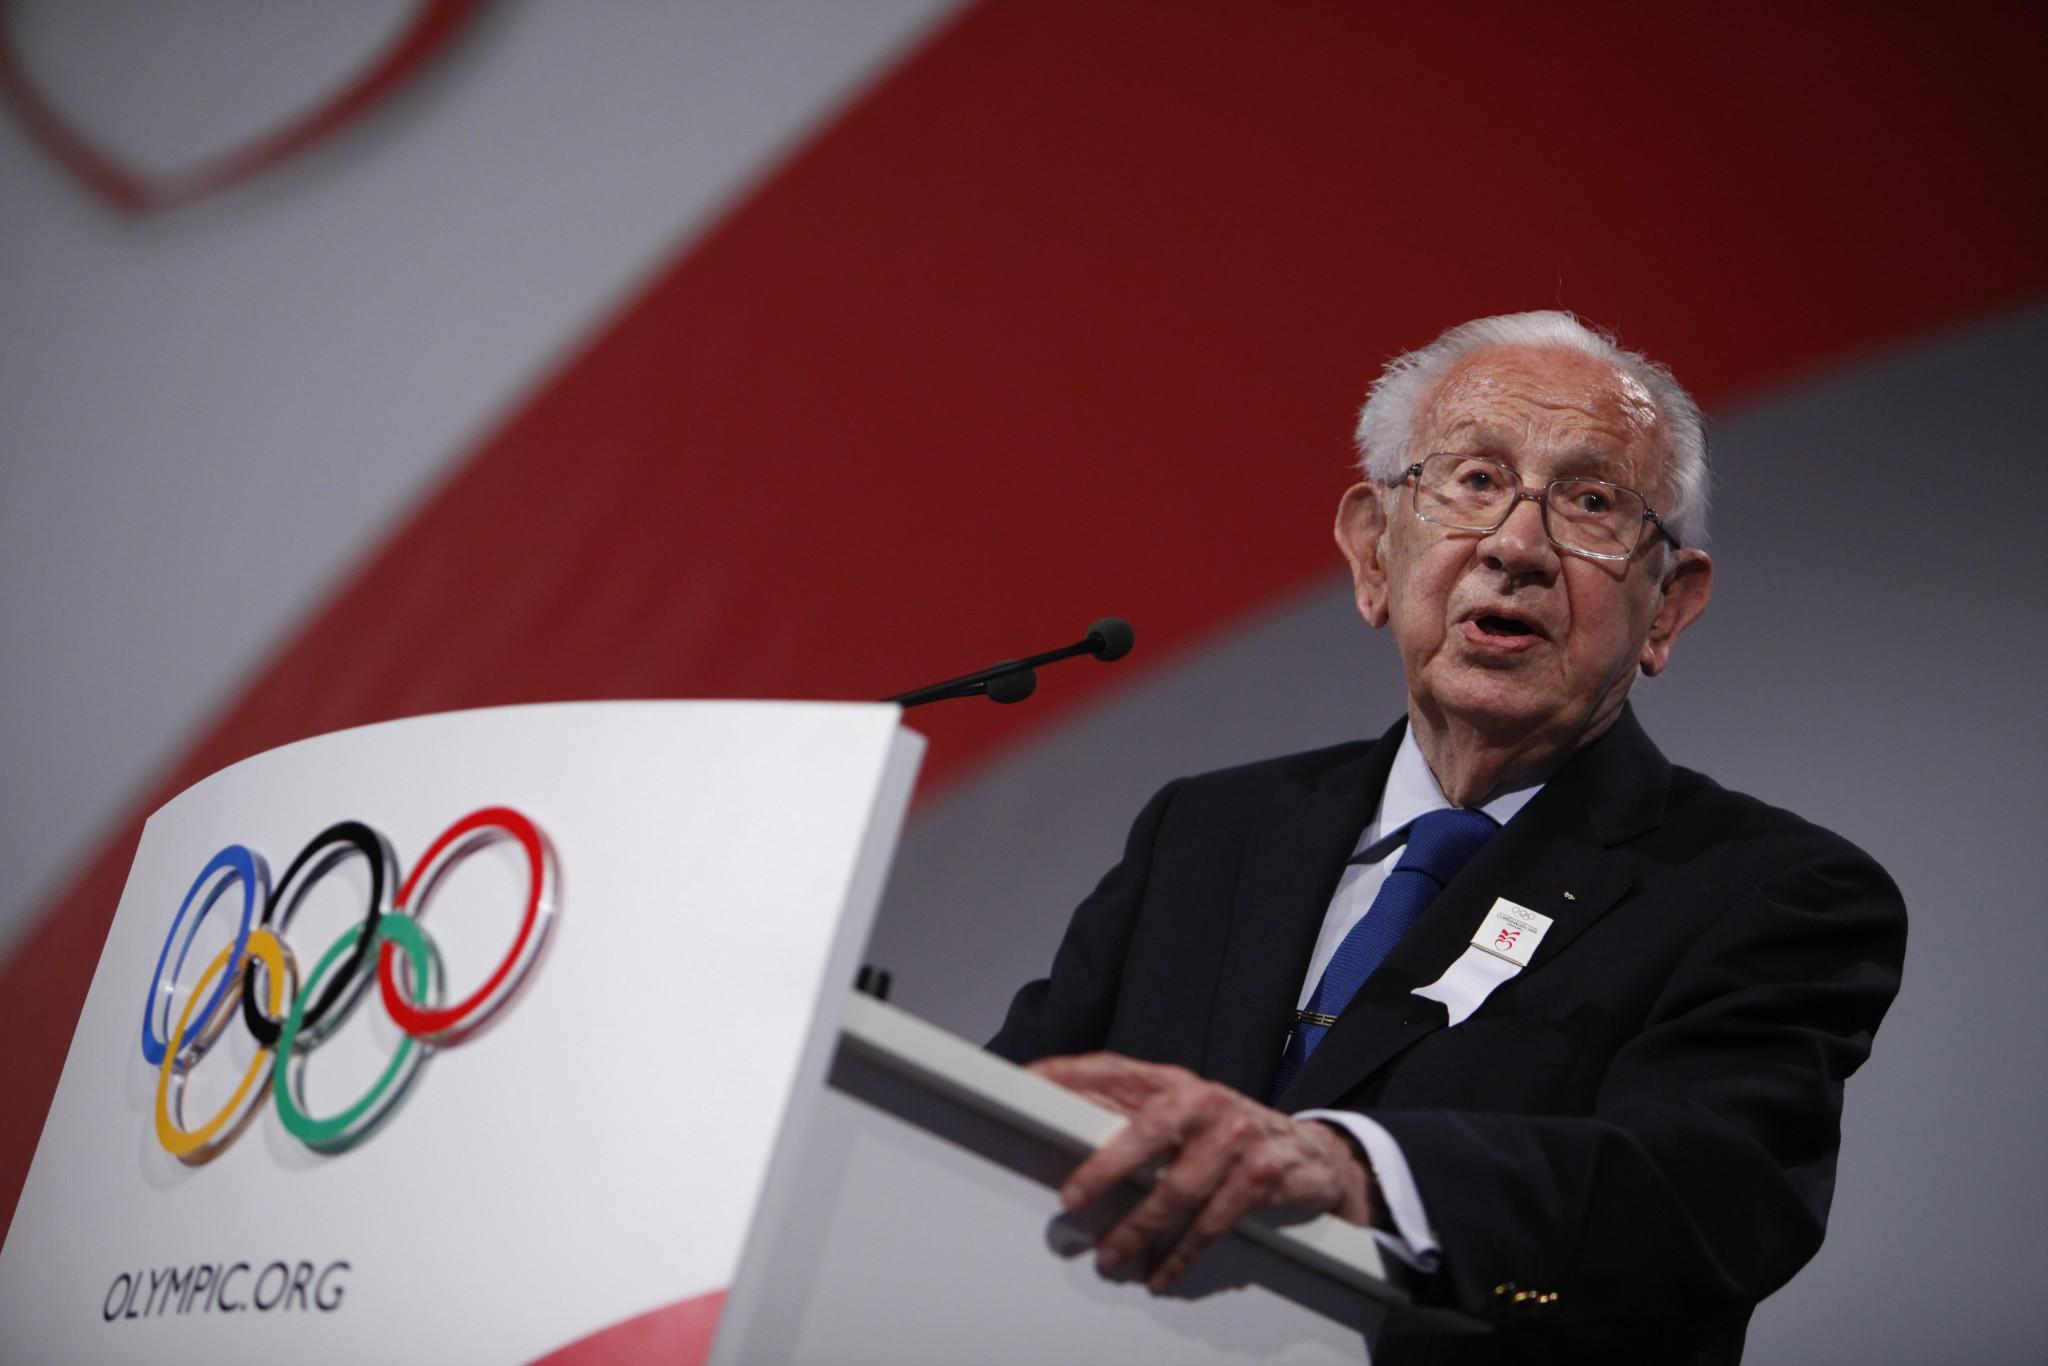 Former IOC President Juan Antonio Samaranch seized power at the historic Baden-Baden IOC Congress in 1981 ©Getty Images